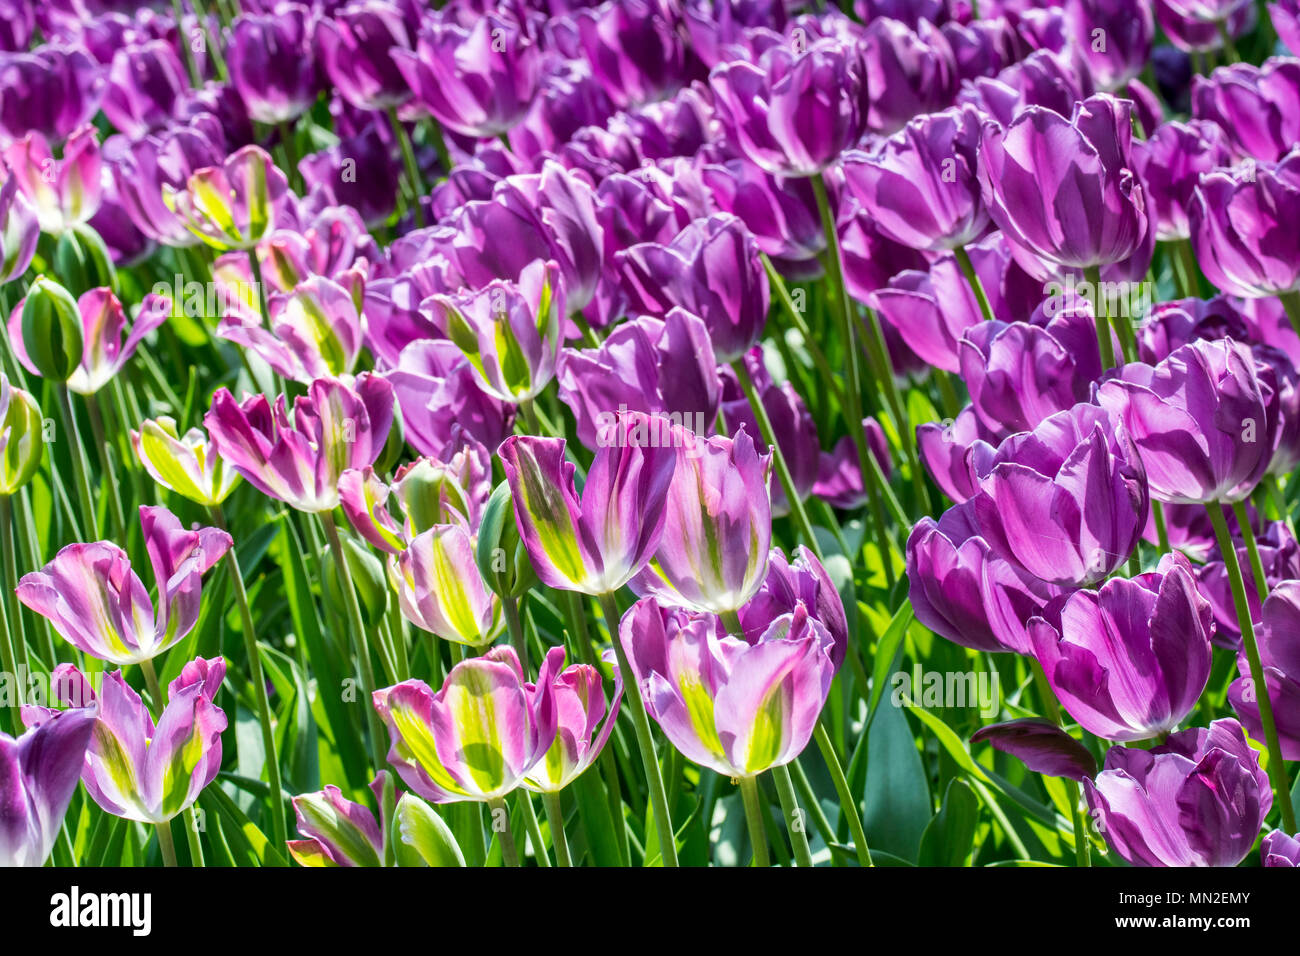 Germany City Flower Stockfotos & Germany City Flower